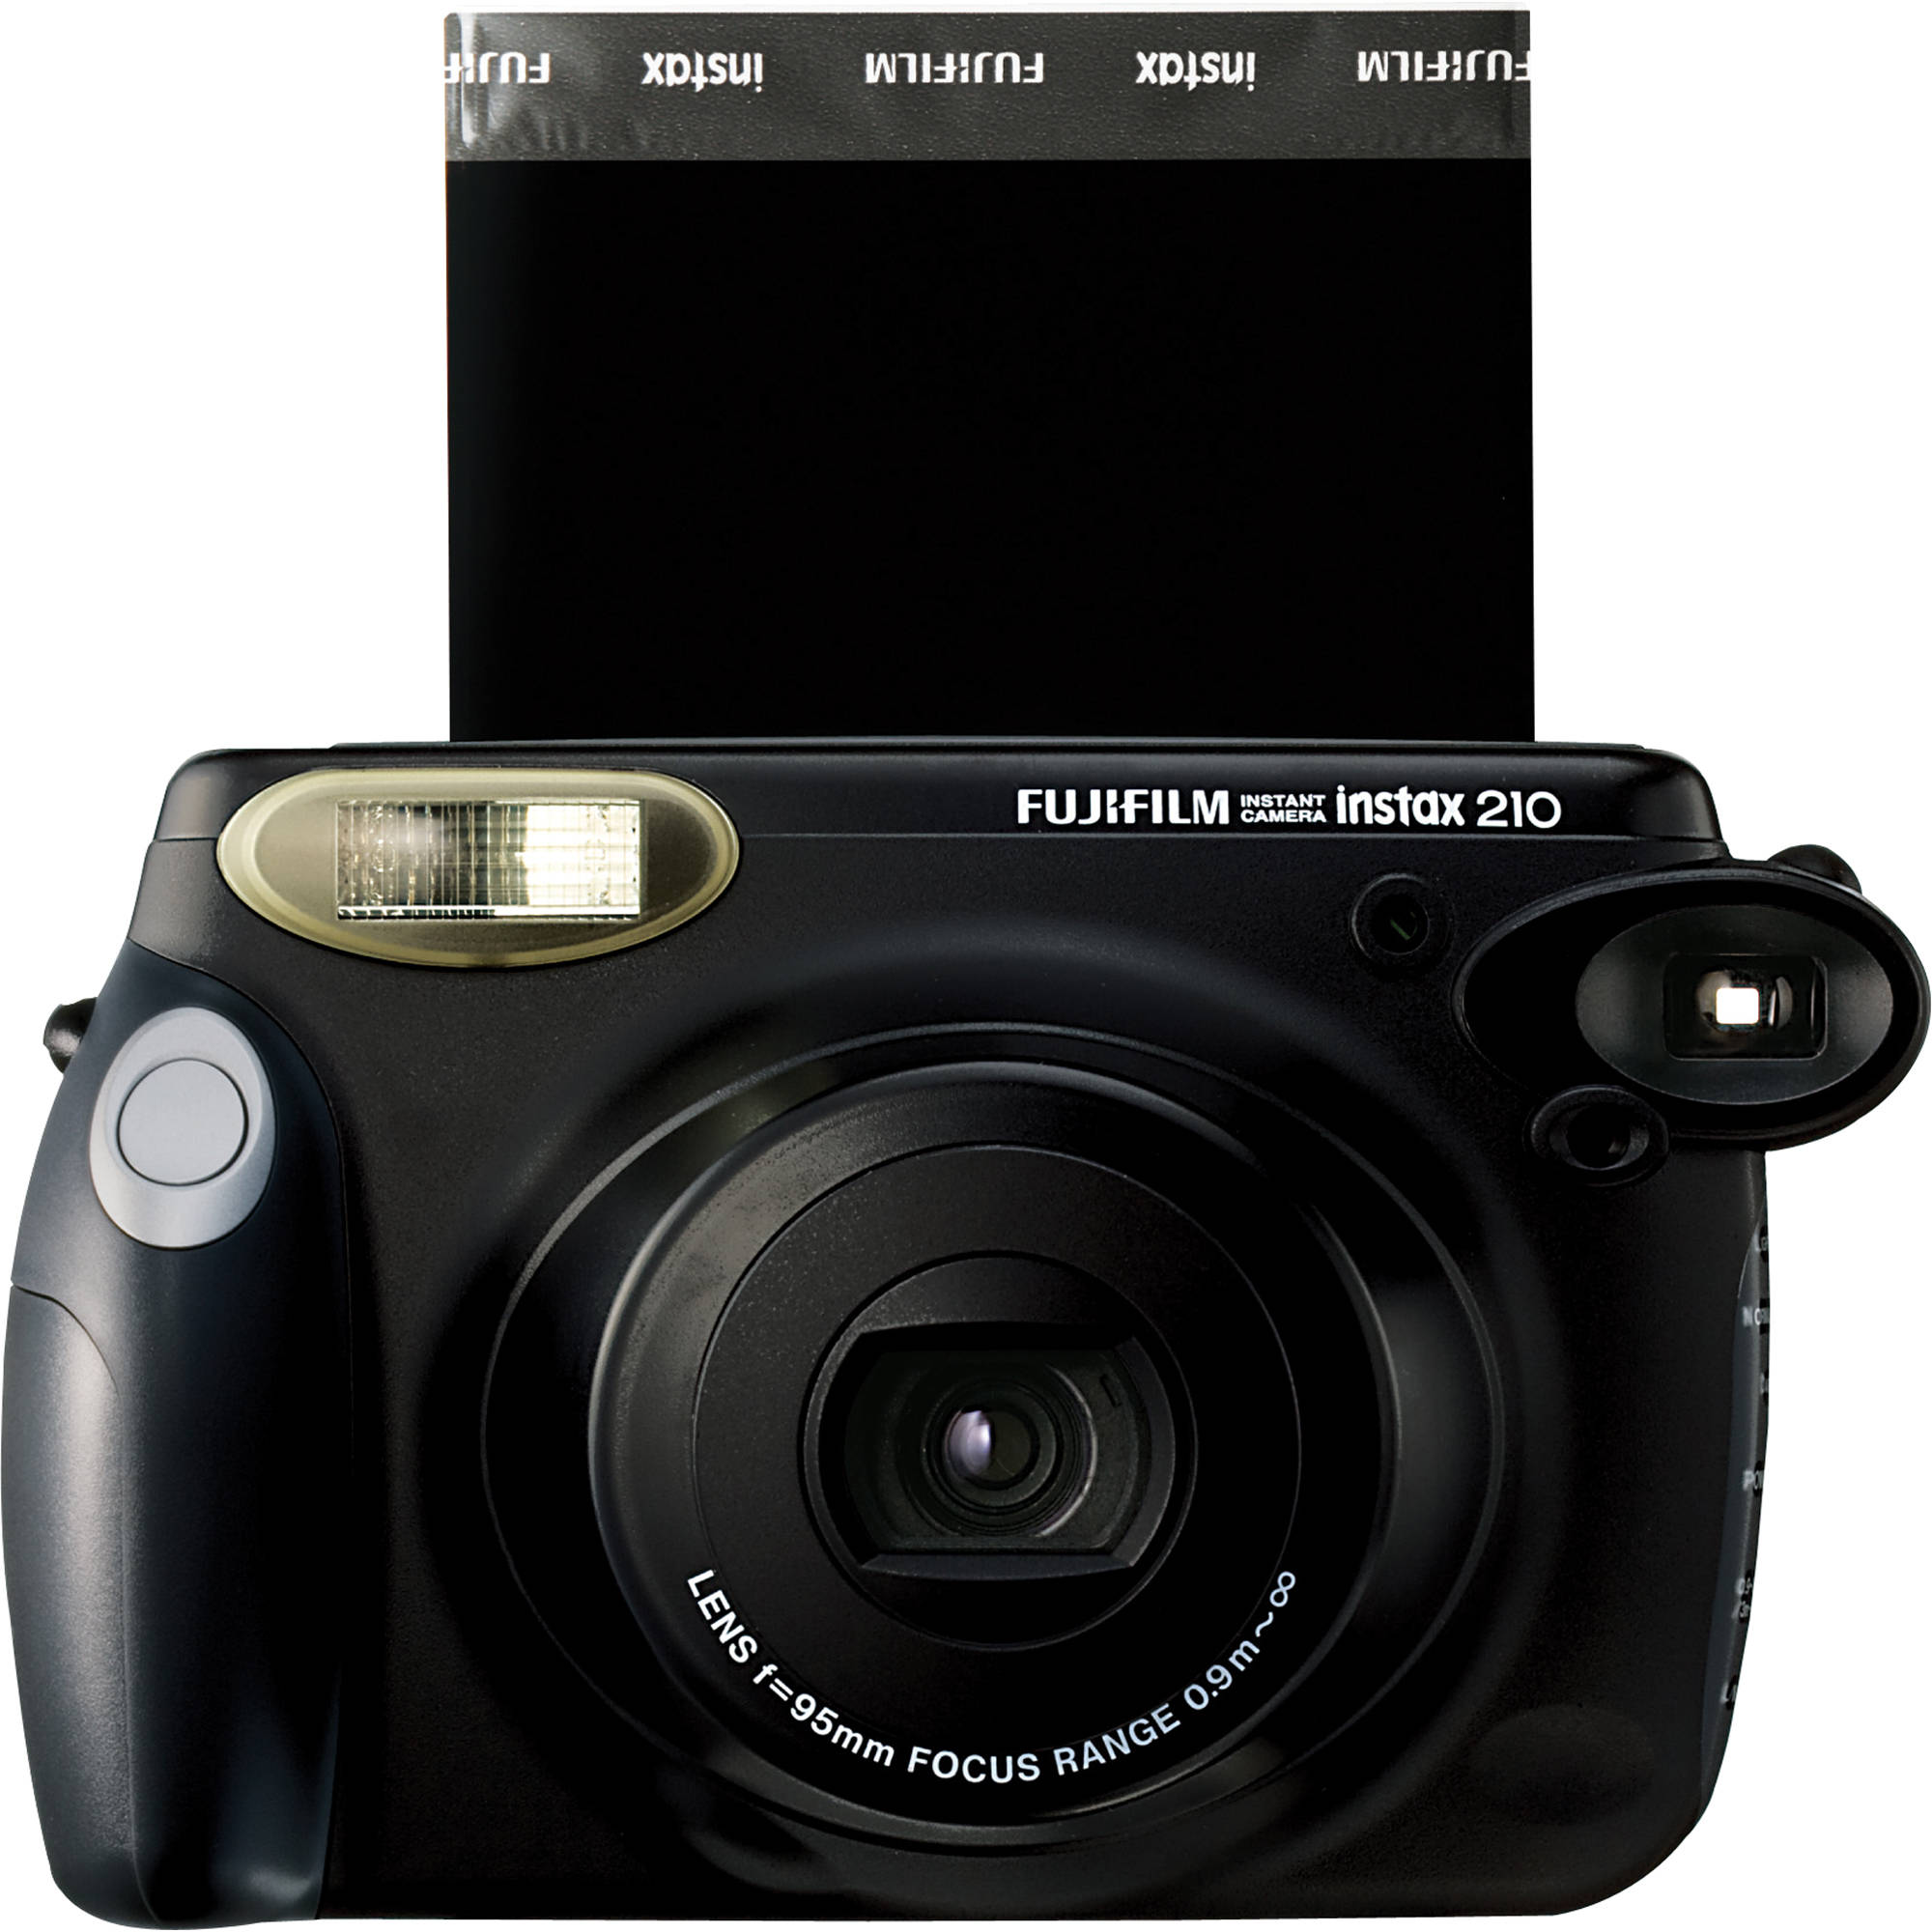 fujifilm instax 210 instant film camera 15950793 b h photo video. Black Bedroom Furniture Sets. Home Design Ideas